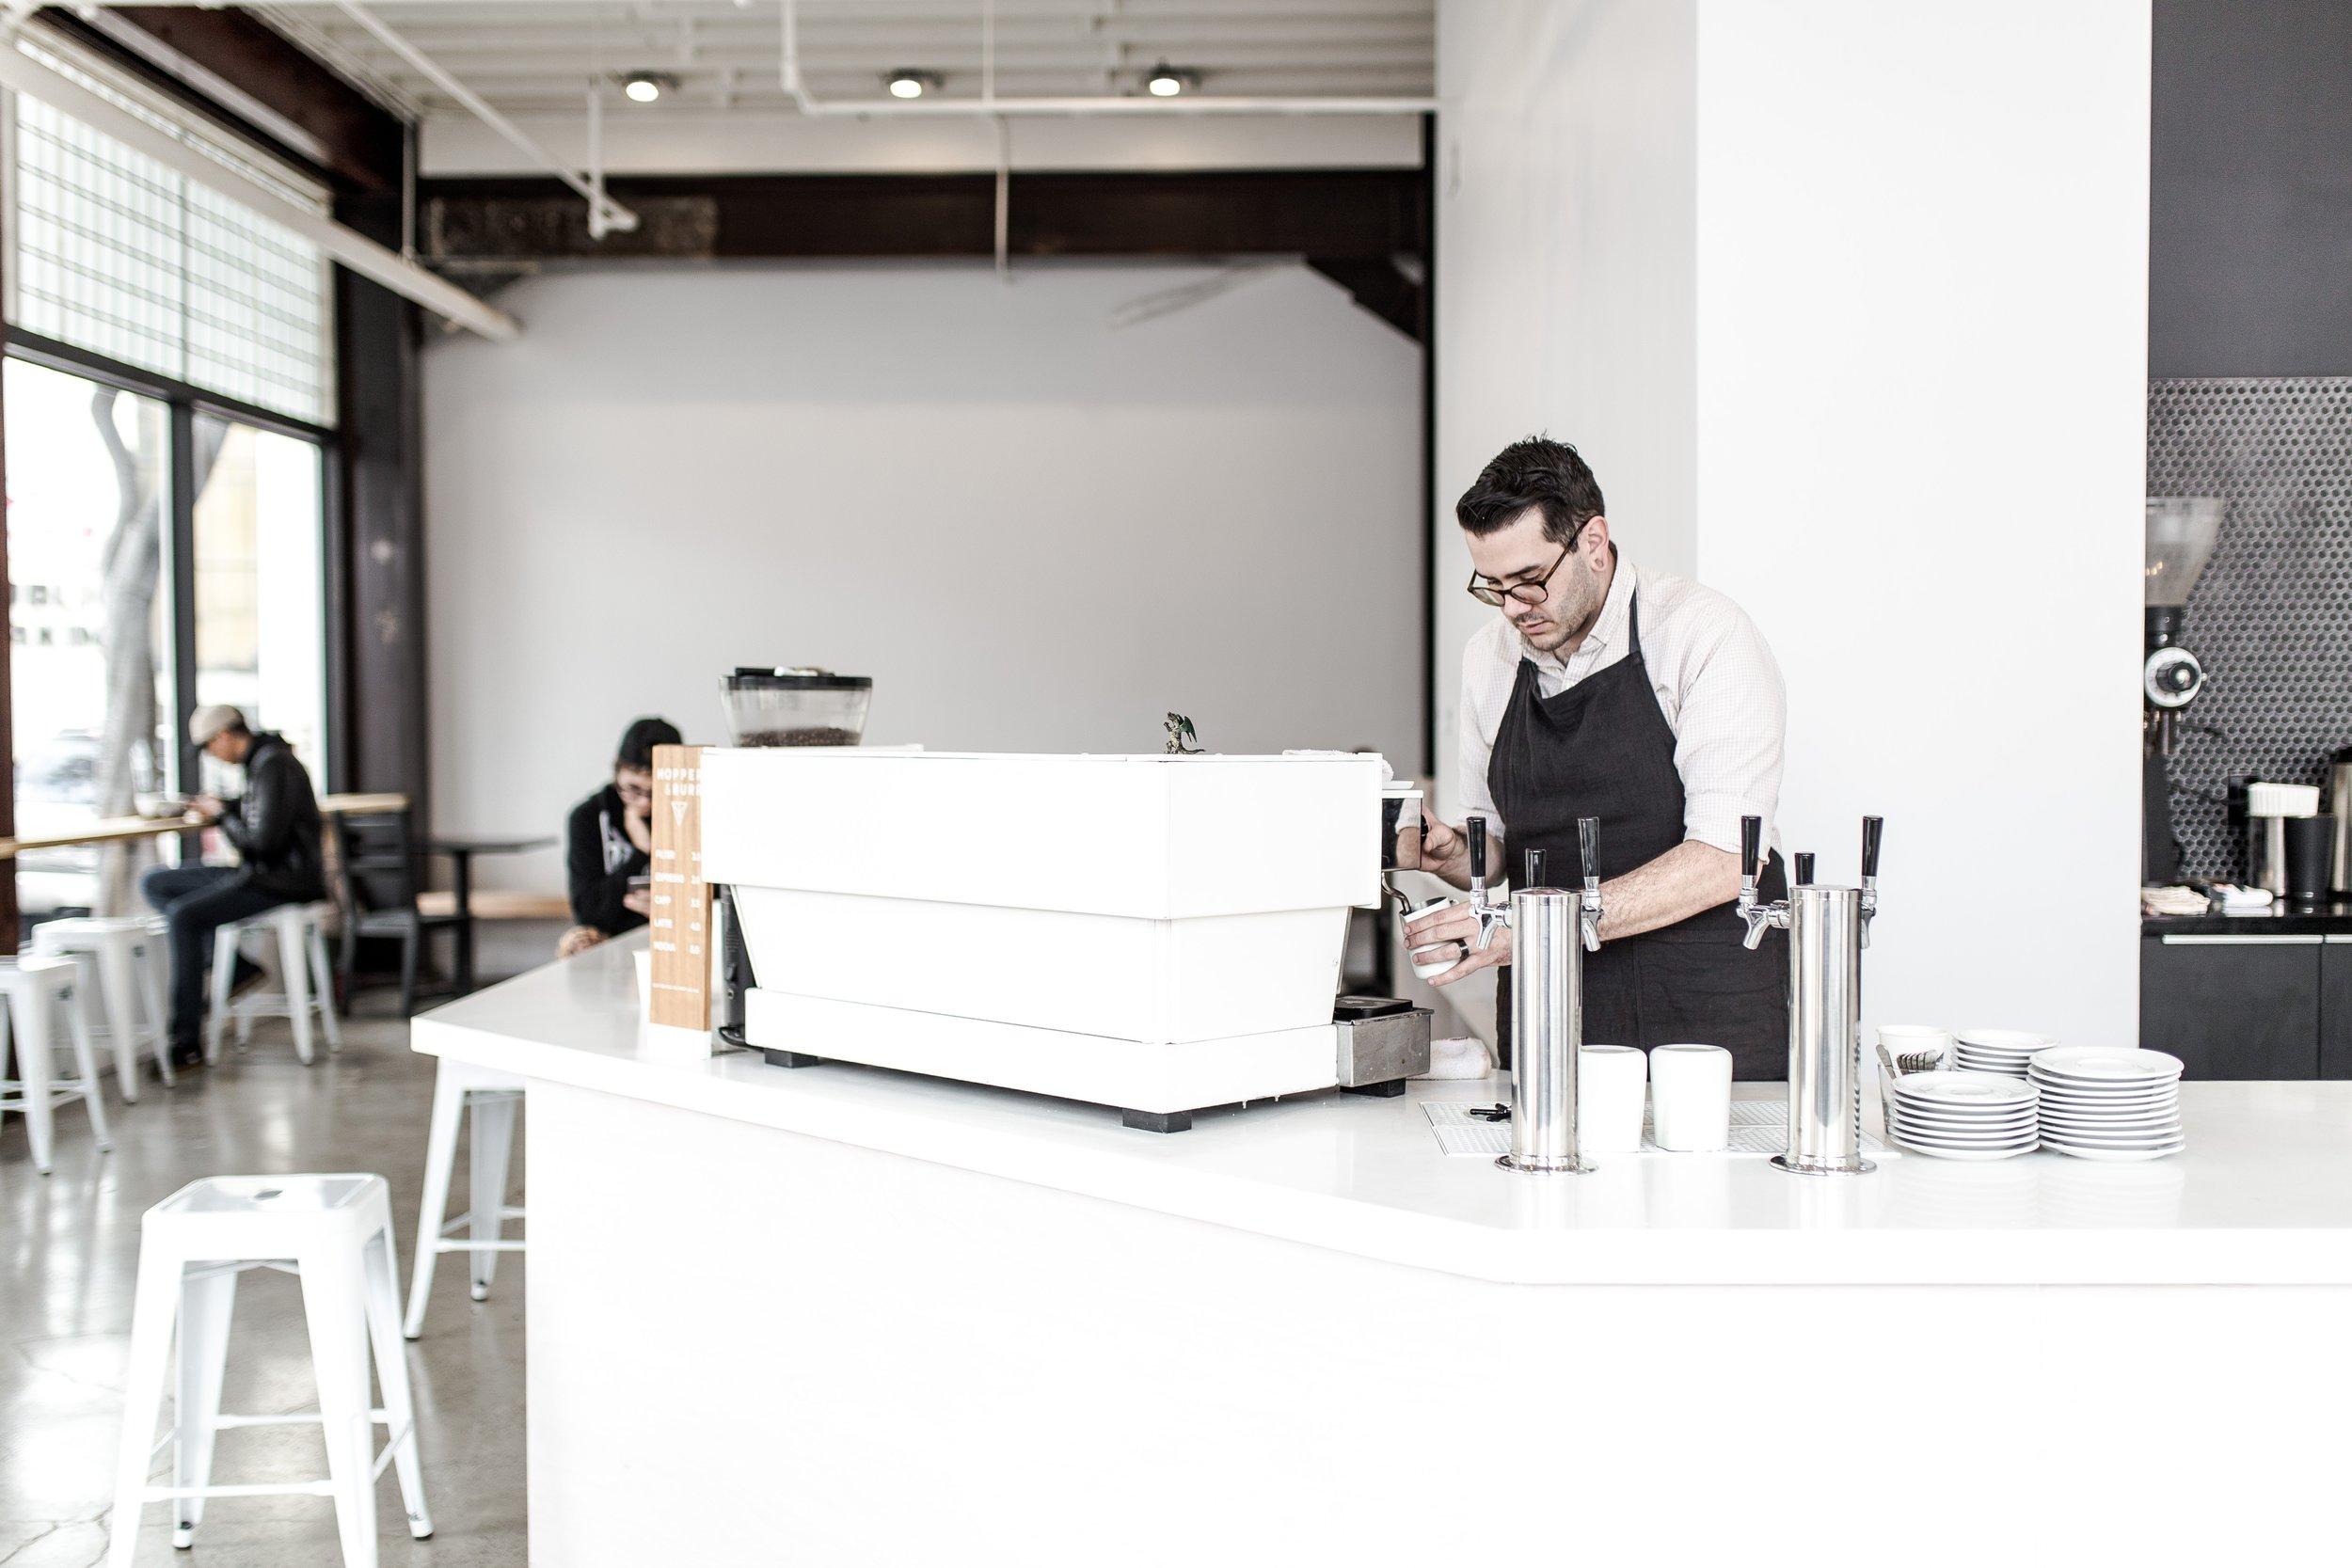 COFFEE-SHOP-tim-wright-174124.jpg